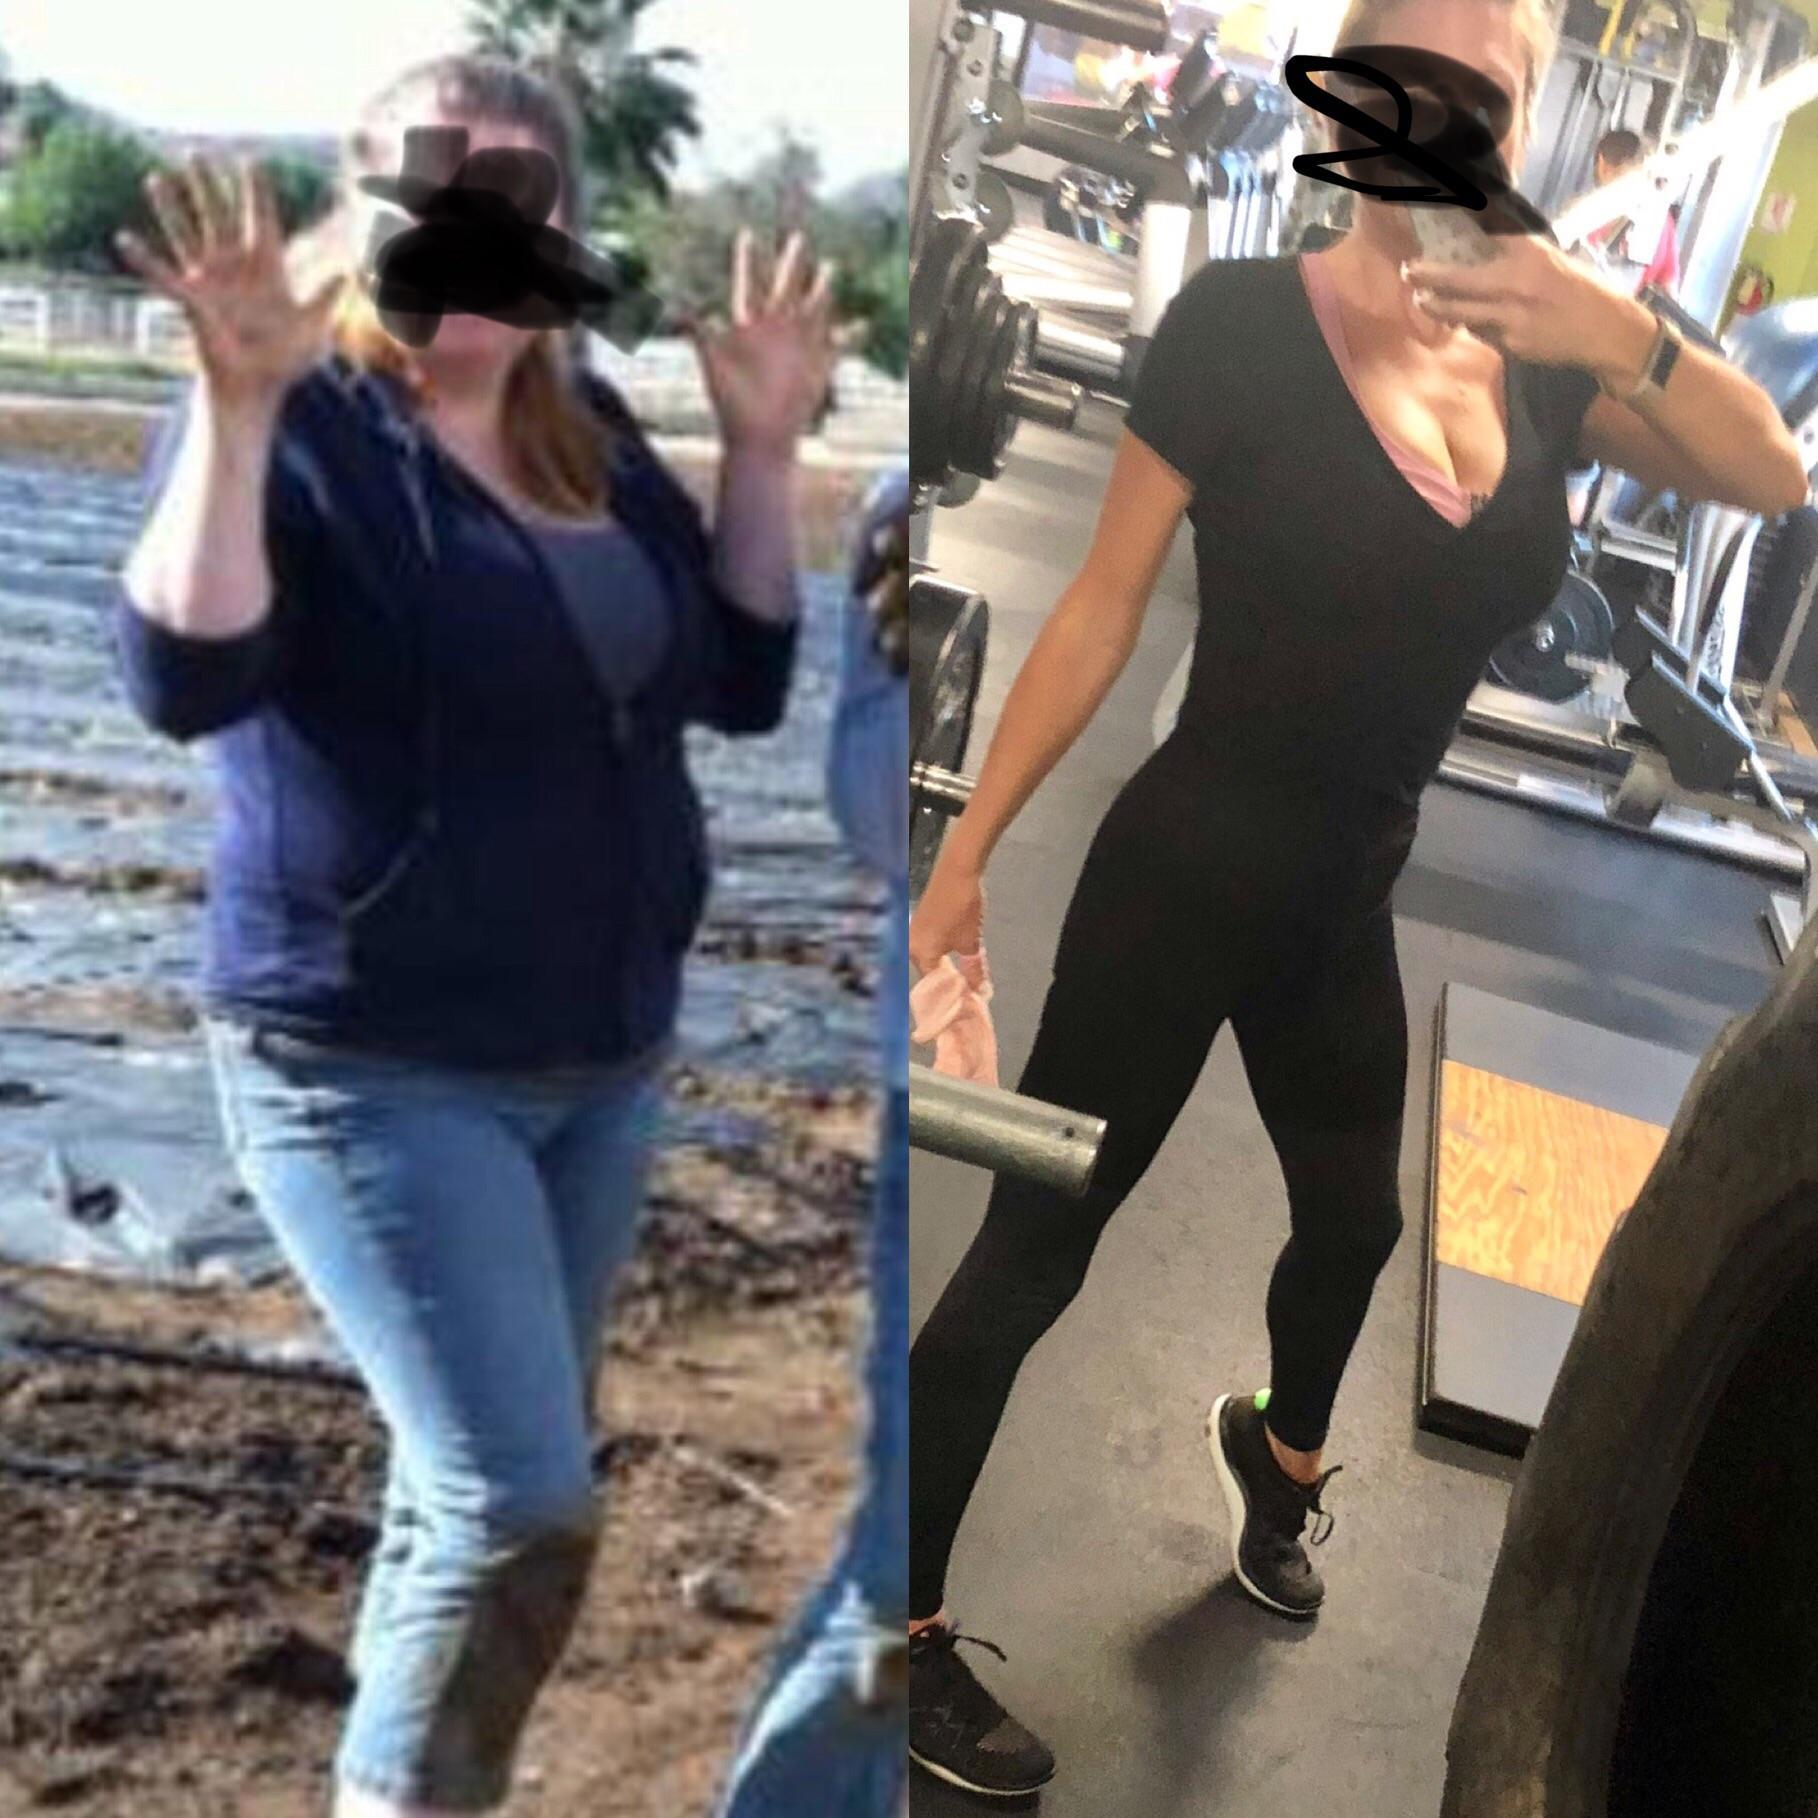 5'7 Female 95 lbs Weight Loss 220 lbs to 125 lbs